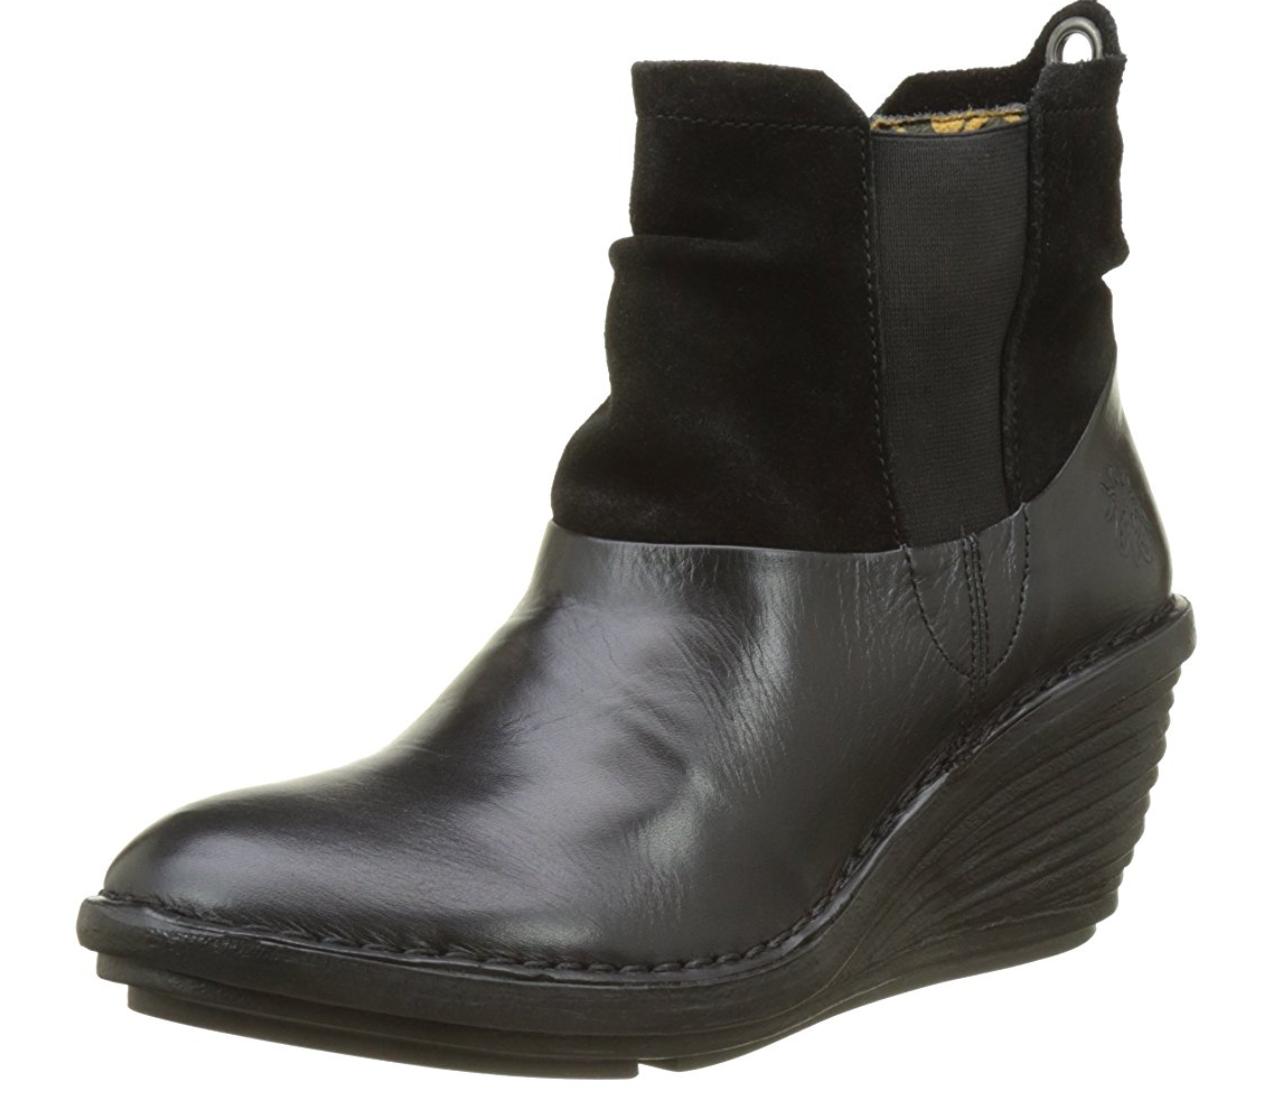 Fly London SULA BLACK Womens Boots Heel Wedge US 10-10.5 EU 41